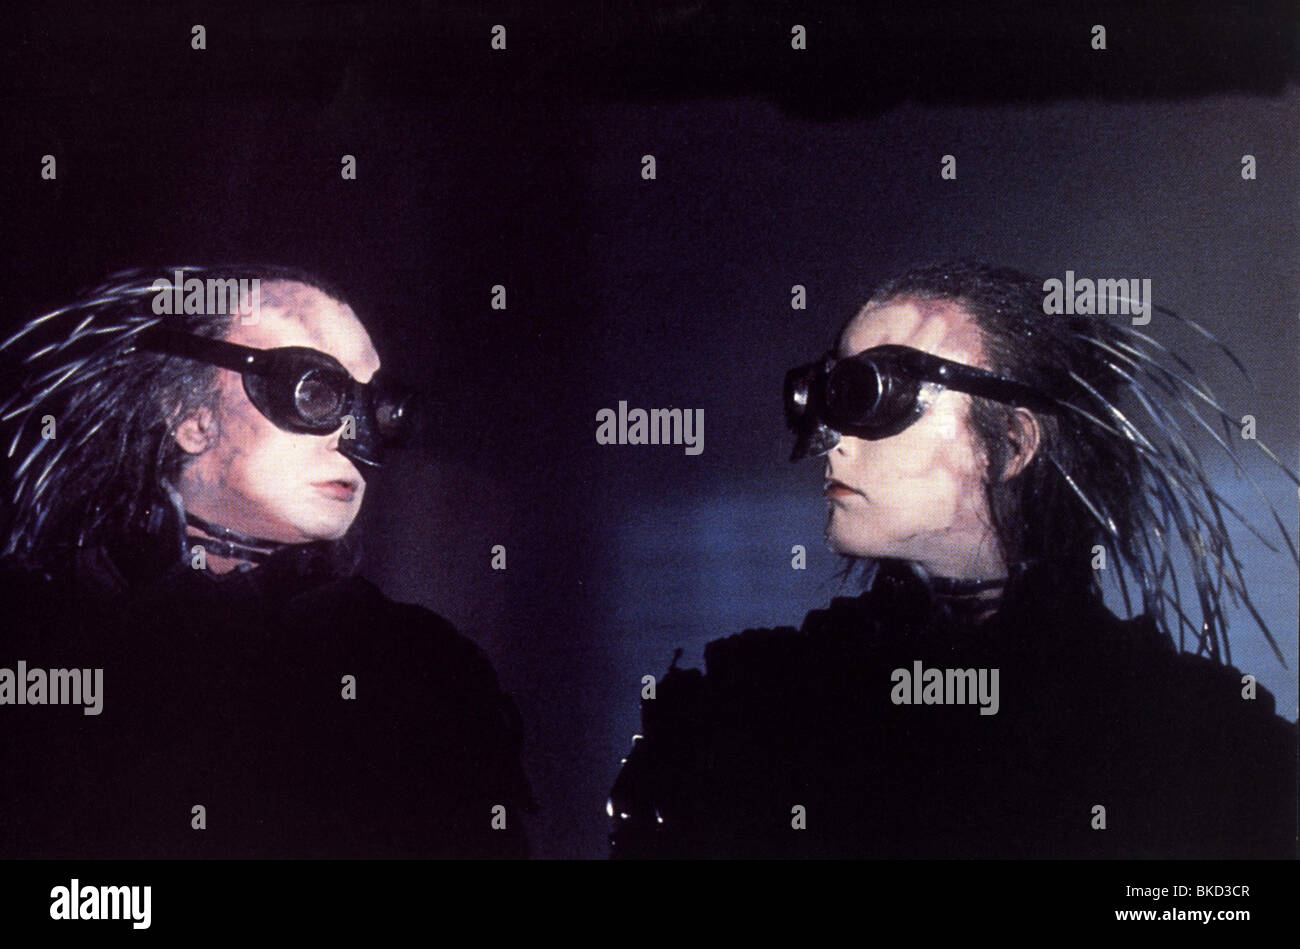 HIGHLANDER 2: THE QUICKENING (1991) HG2 001FOH - Stock Image